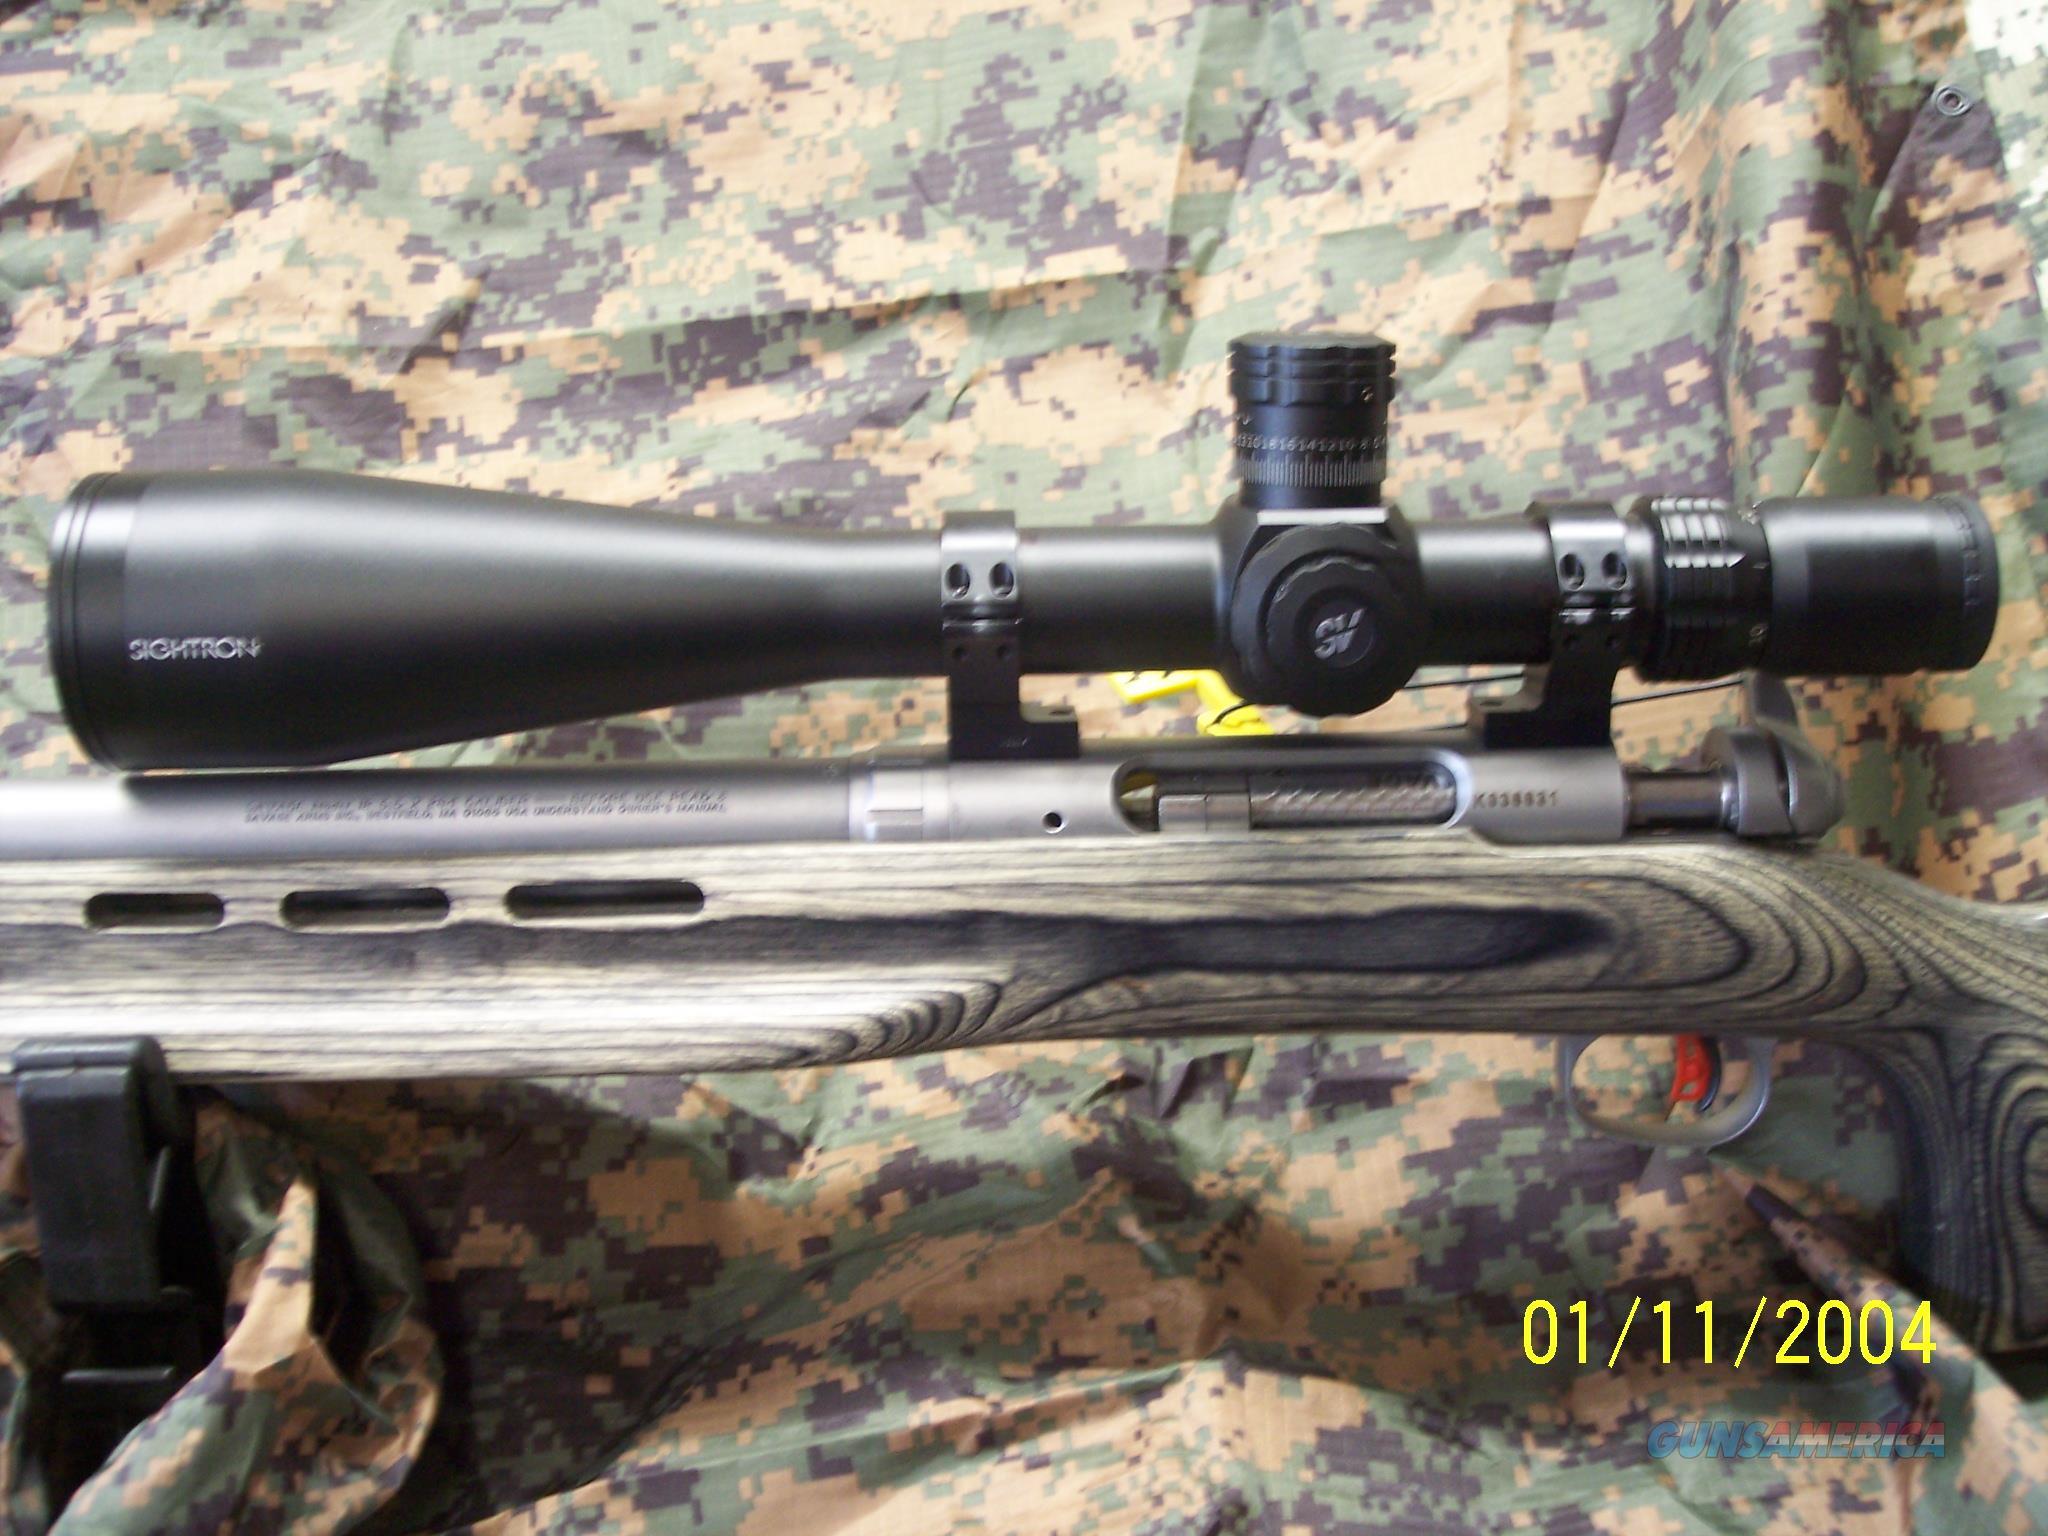 Sightron SV Long Range Target scope  Non-Guns > Scopes/Mounts/Rings & Optics > Tactical Scopes > Variable Recticle